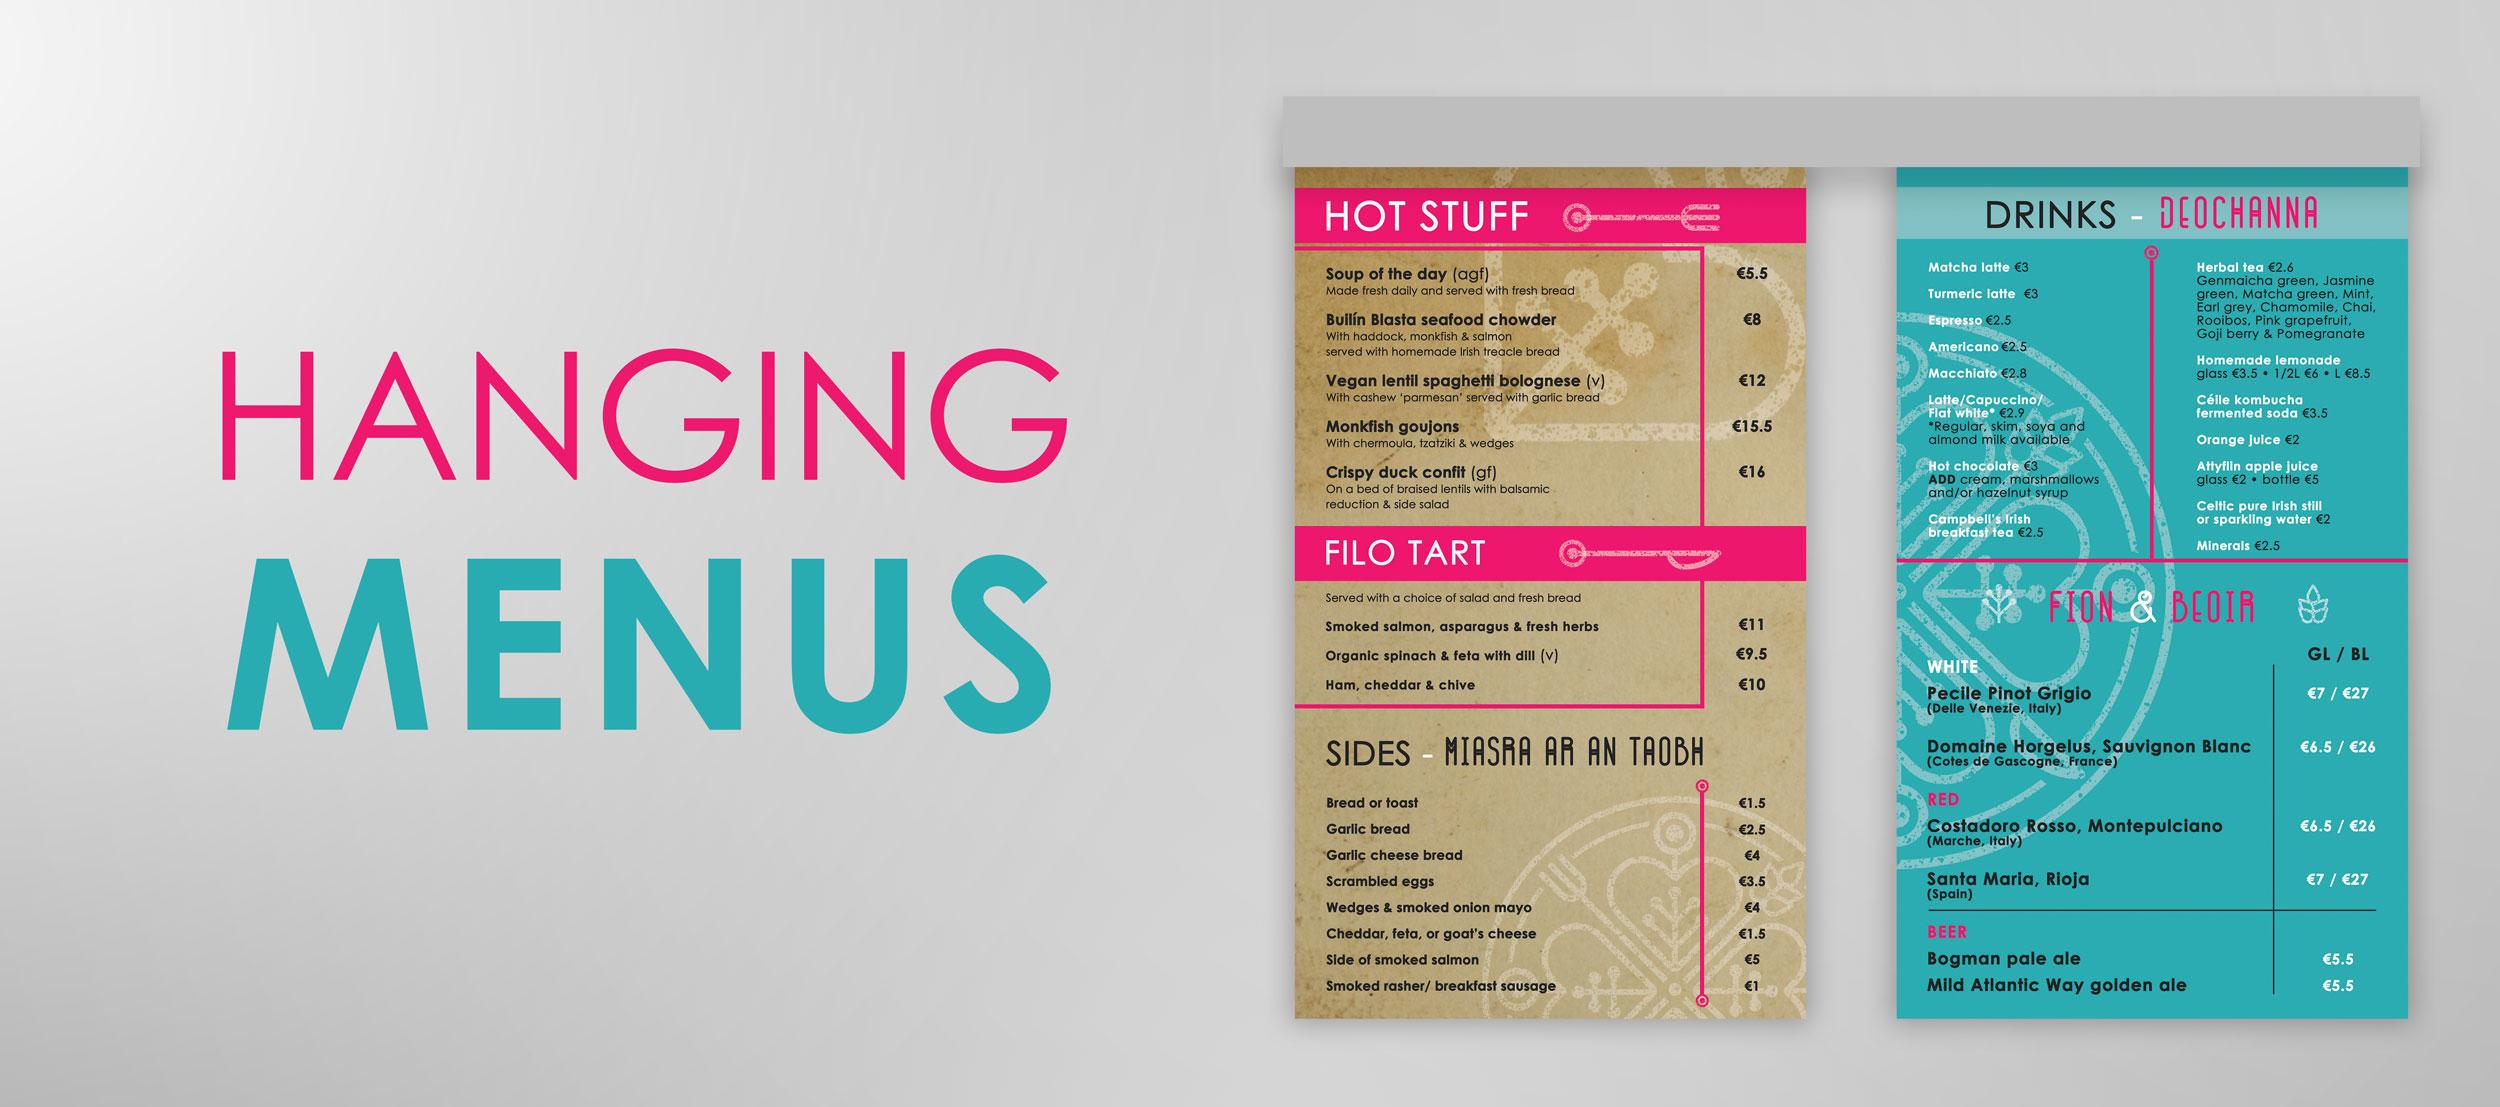 Hanging-Menus-1.jpg